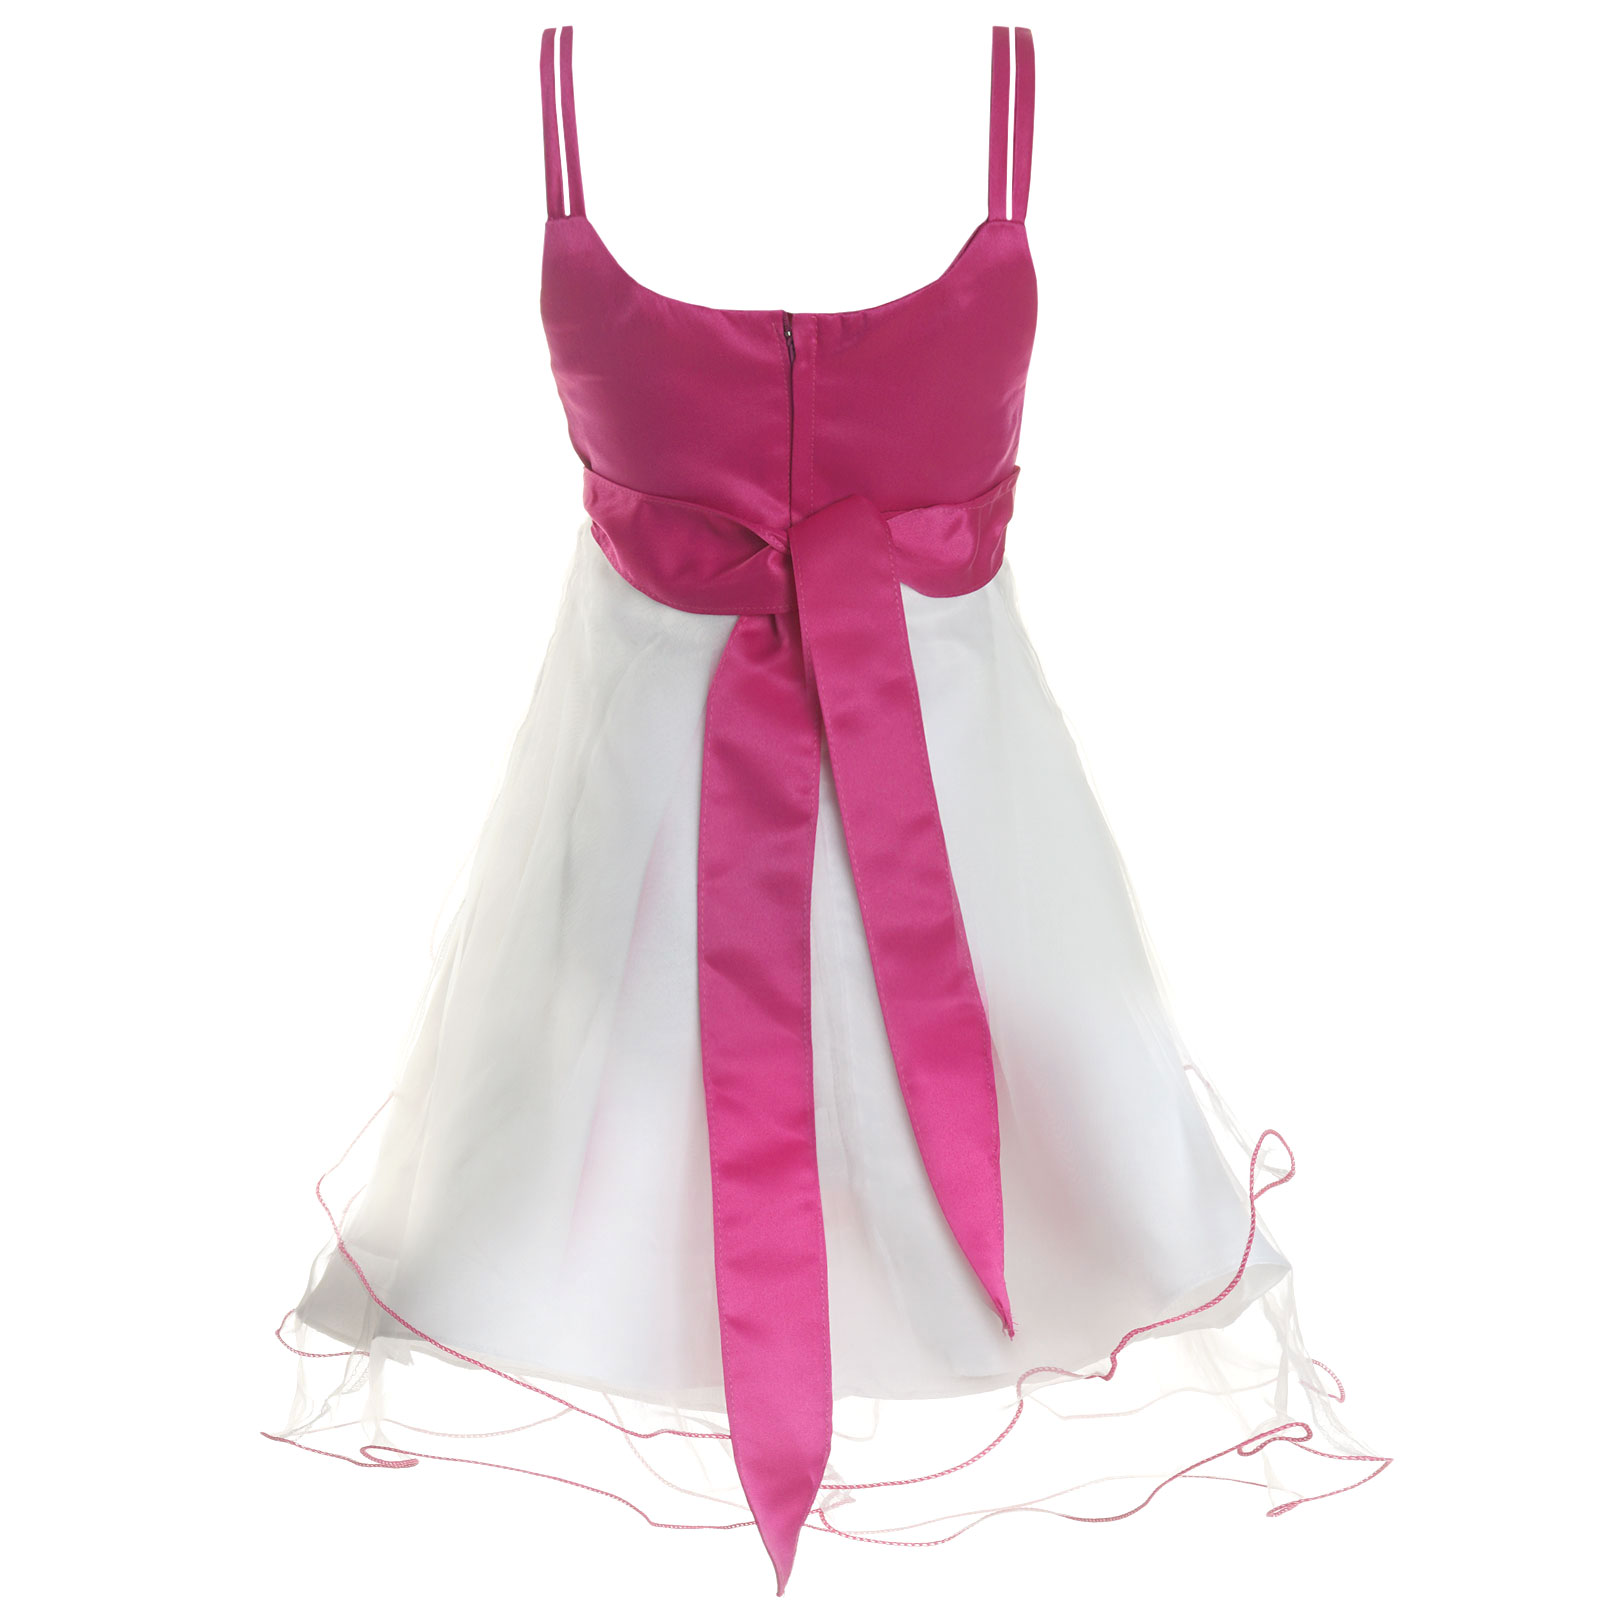 Maedchen-Kinder-Kleid-Peticoat-Festkleid-Lang-Arm-Kostuem-mit-Bolero-Rose-21476 Indexbild 13